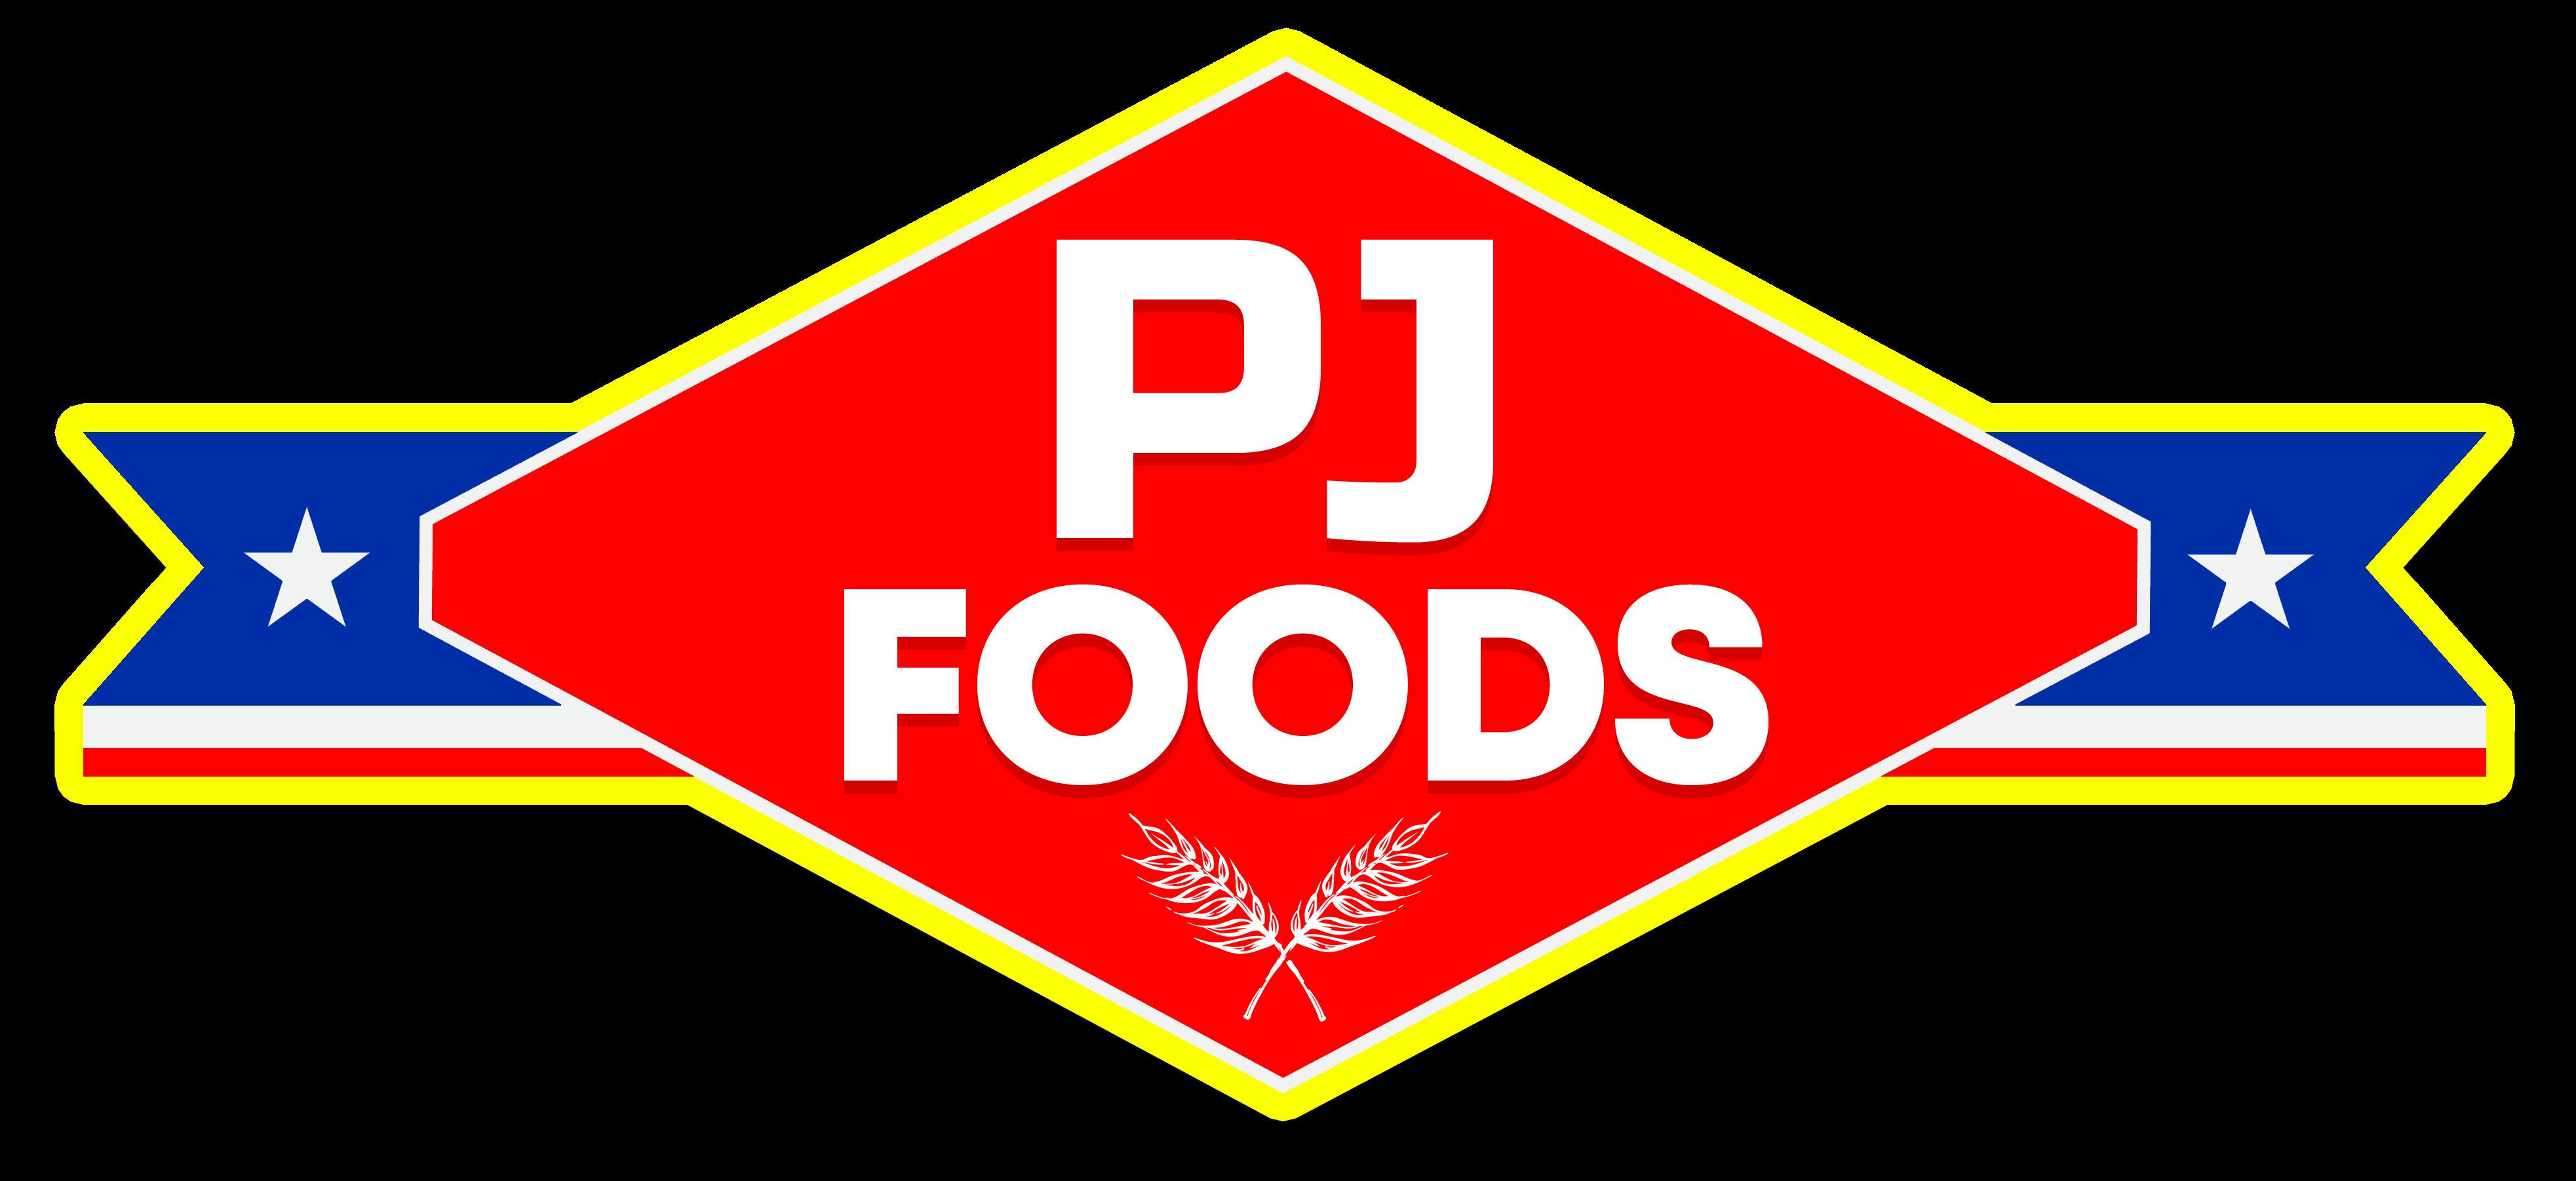 PJ FOODS